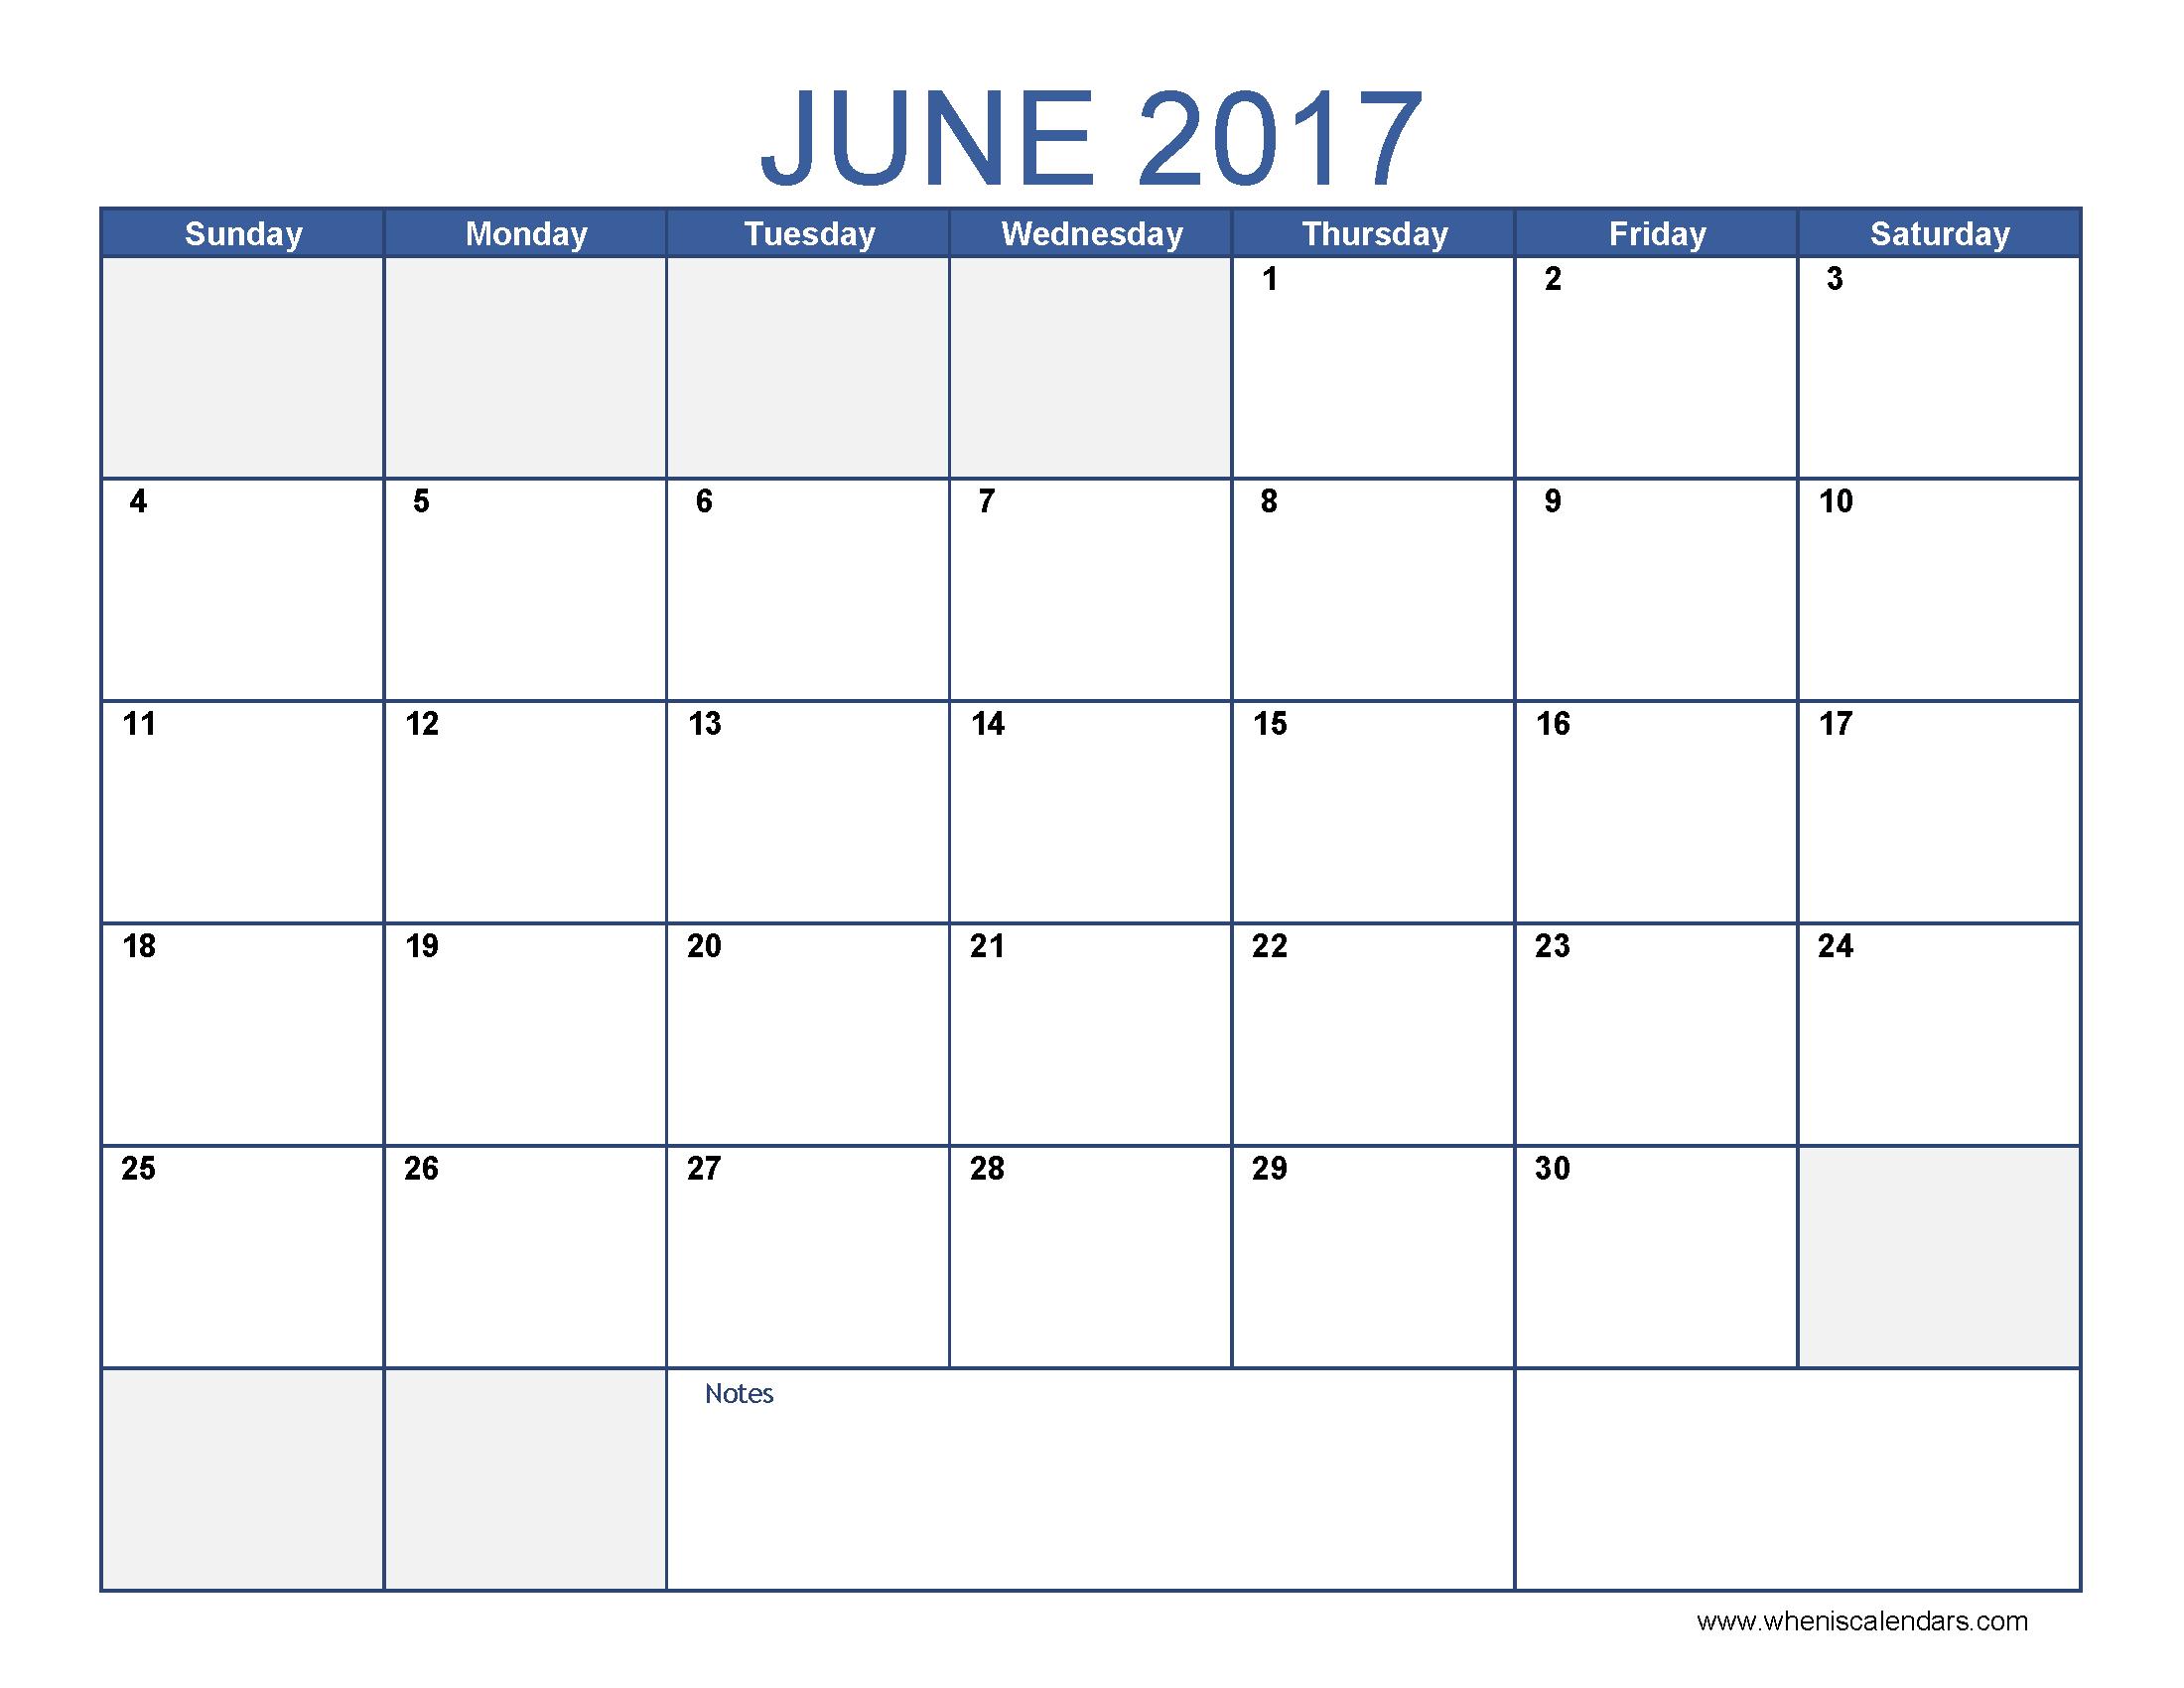 june 2017 calendar excel template